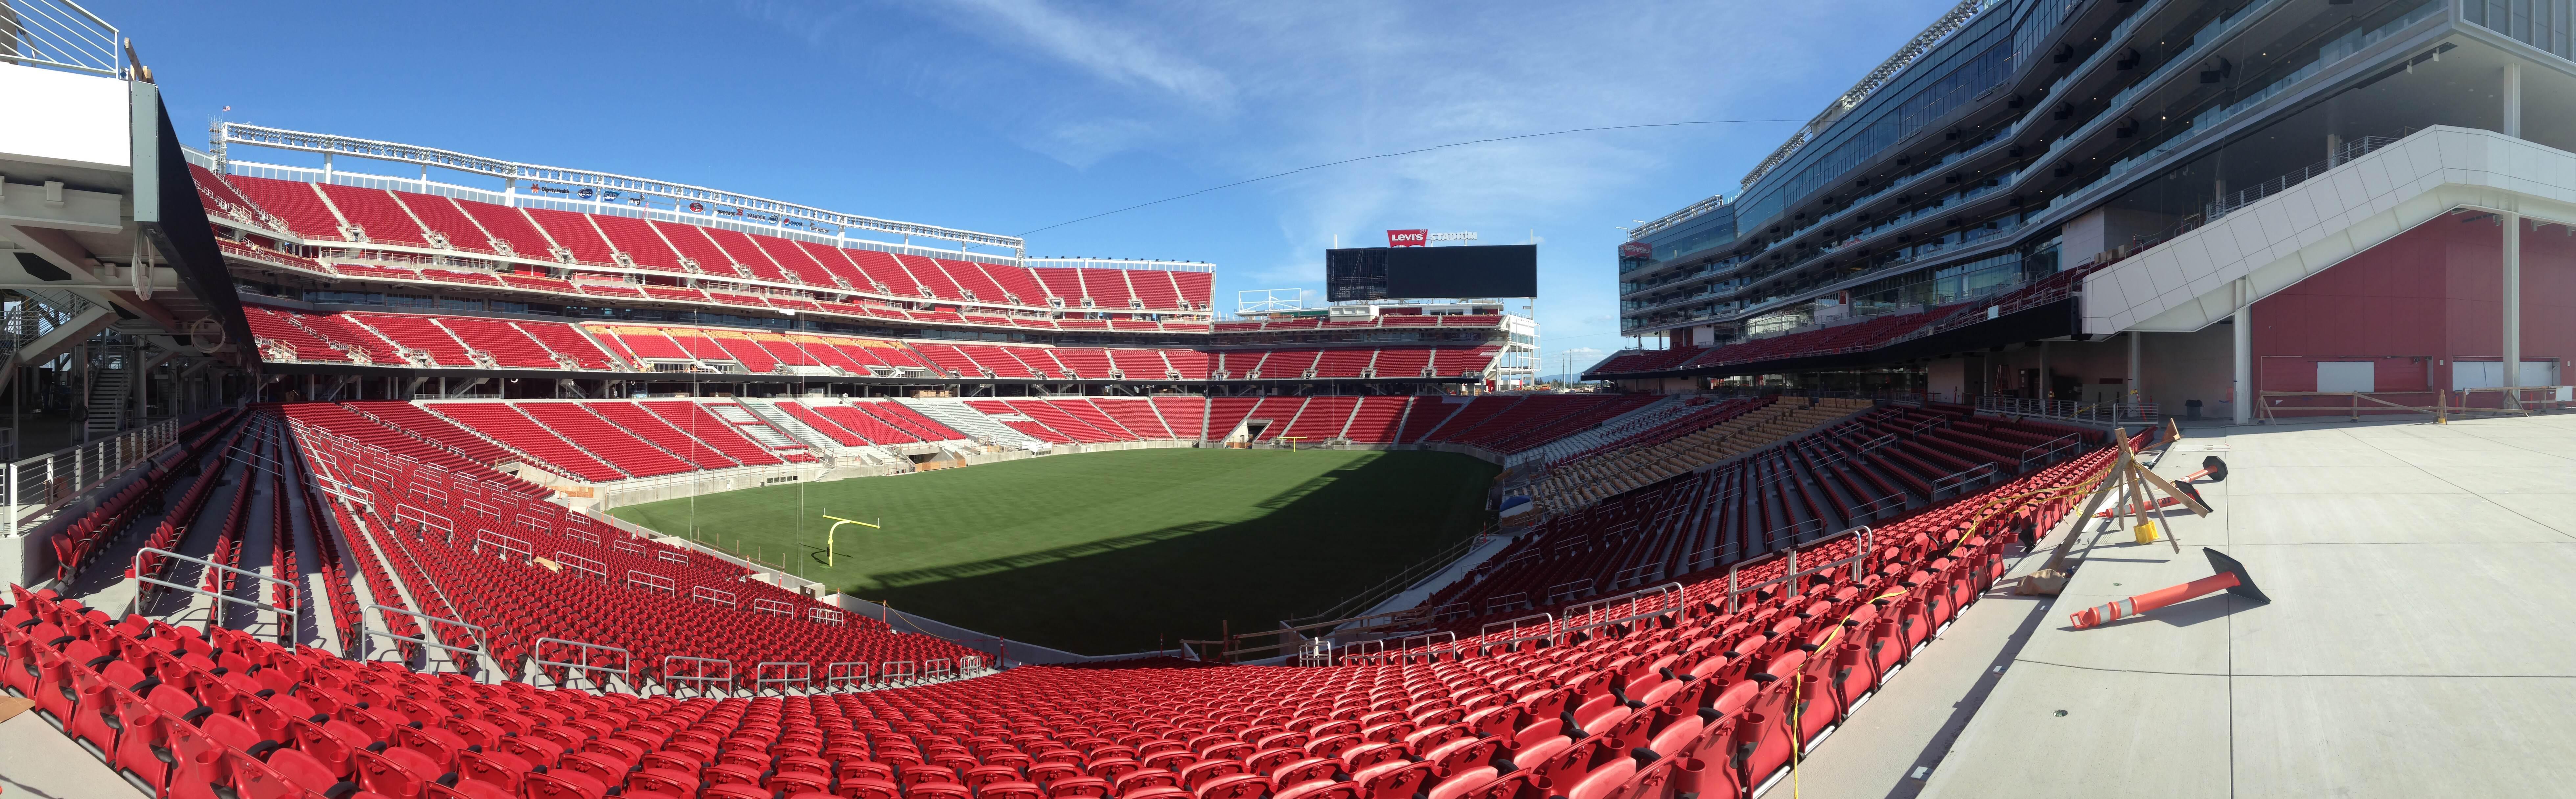 Image 3 of Scott & Sarah: 49ers Fan Proposes in New Stadium